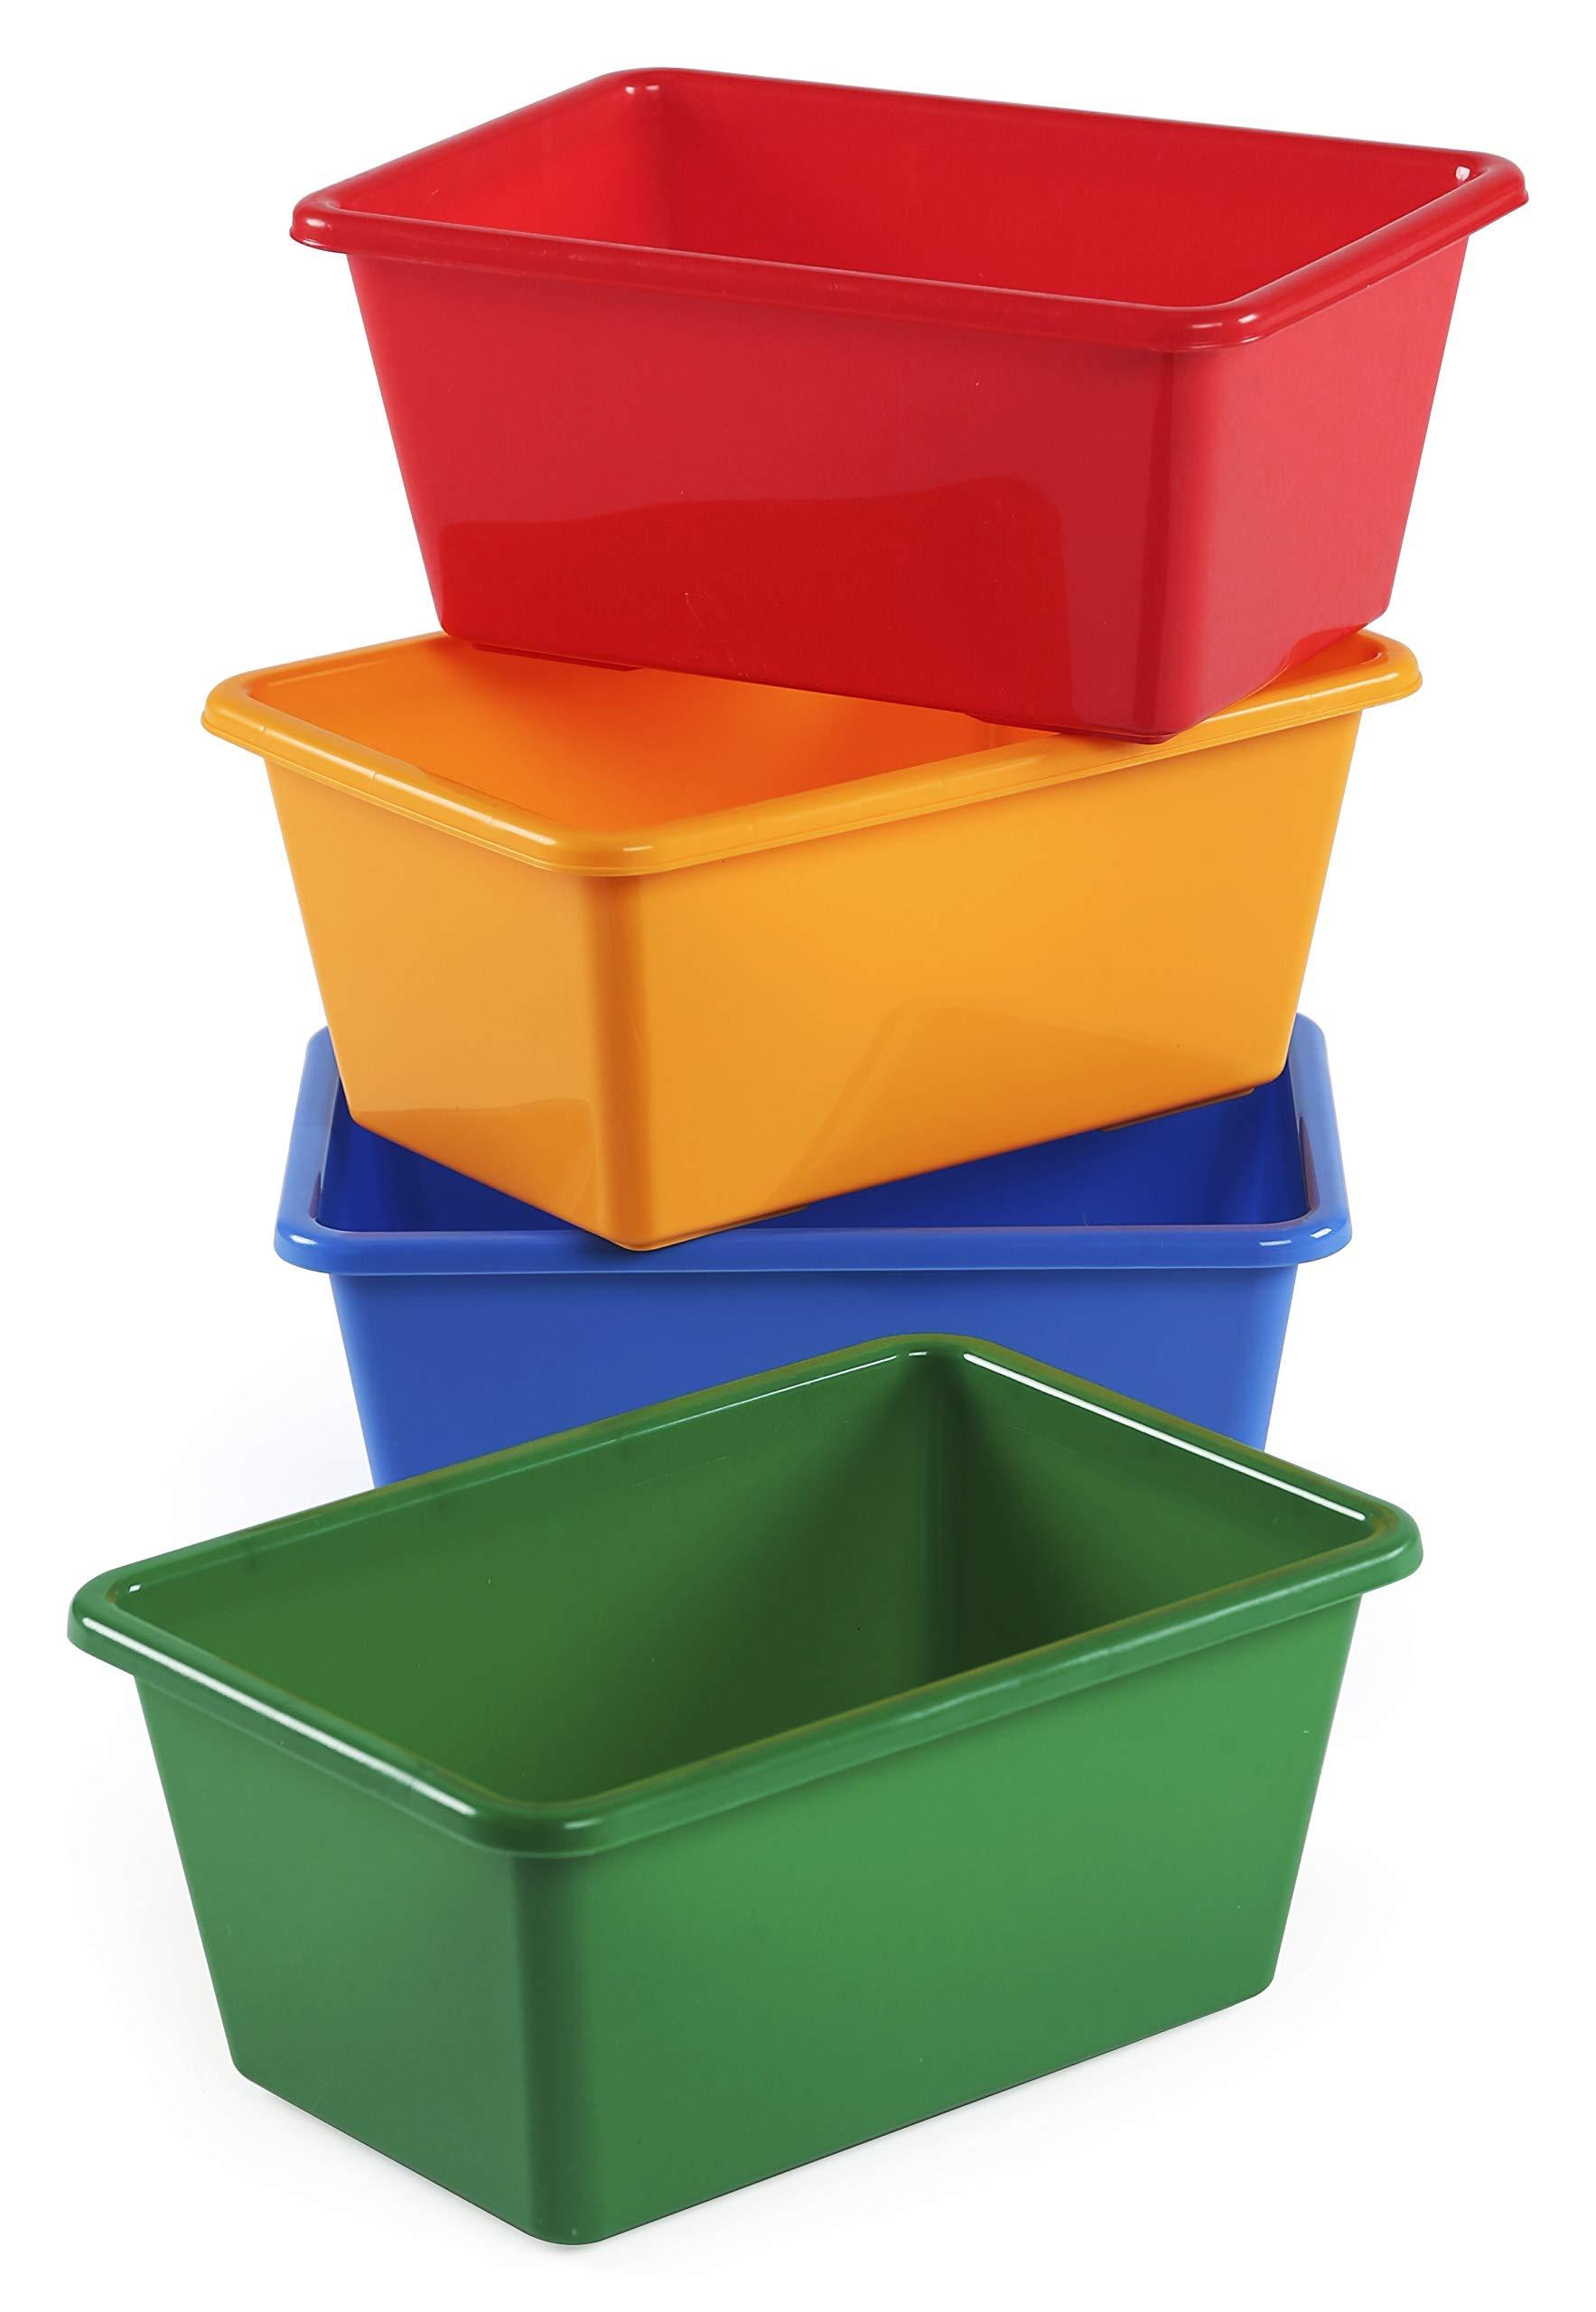 Tot Tutors Primary Colors Storage